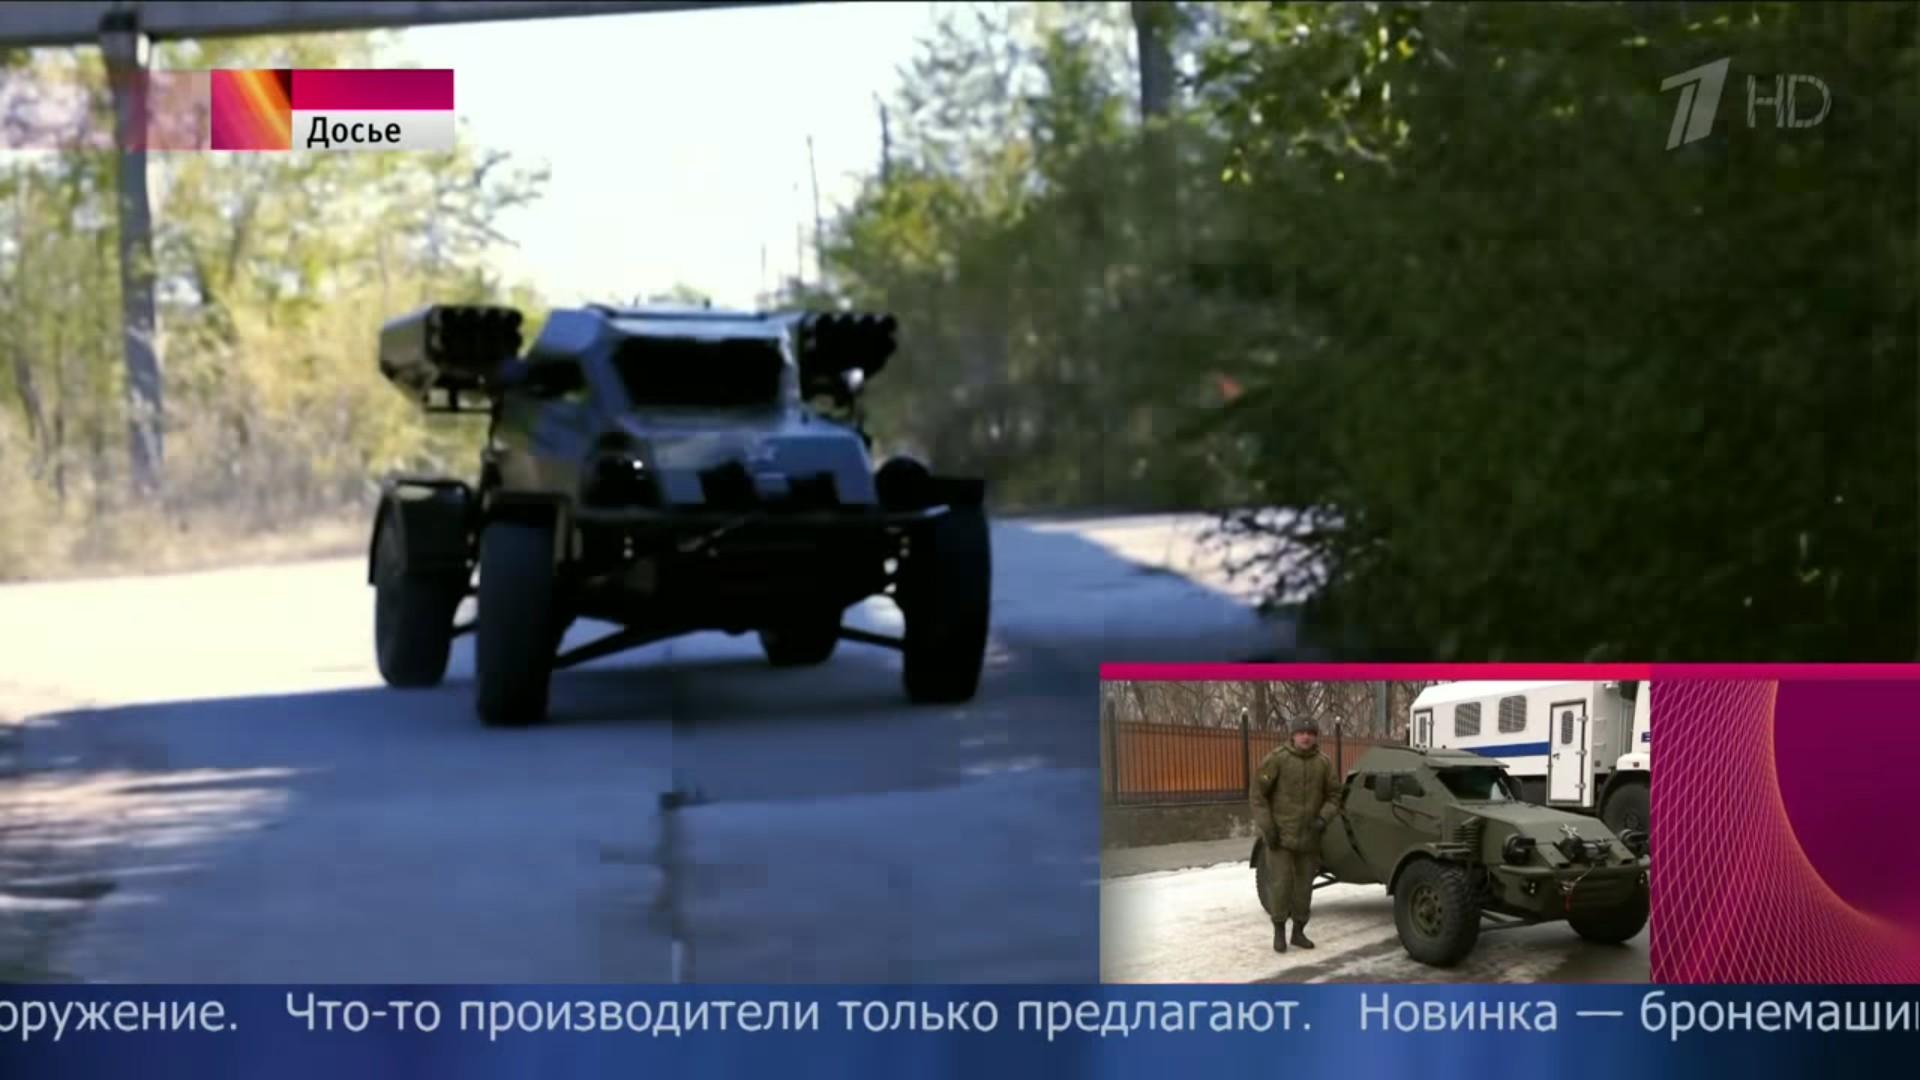 http://s2.uploads.ru/0ckuA.jpg